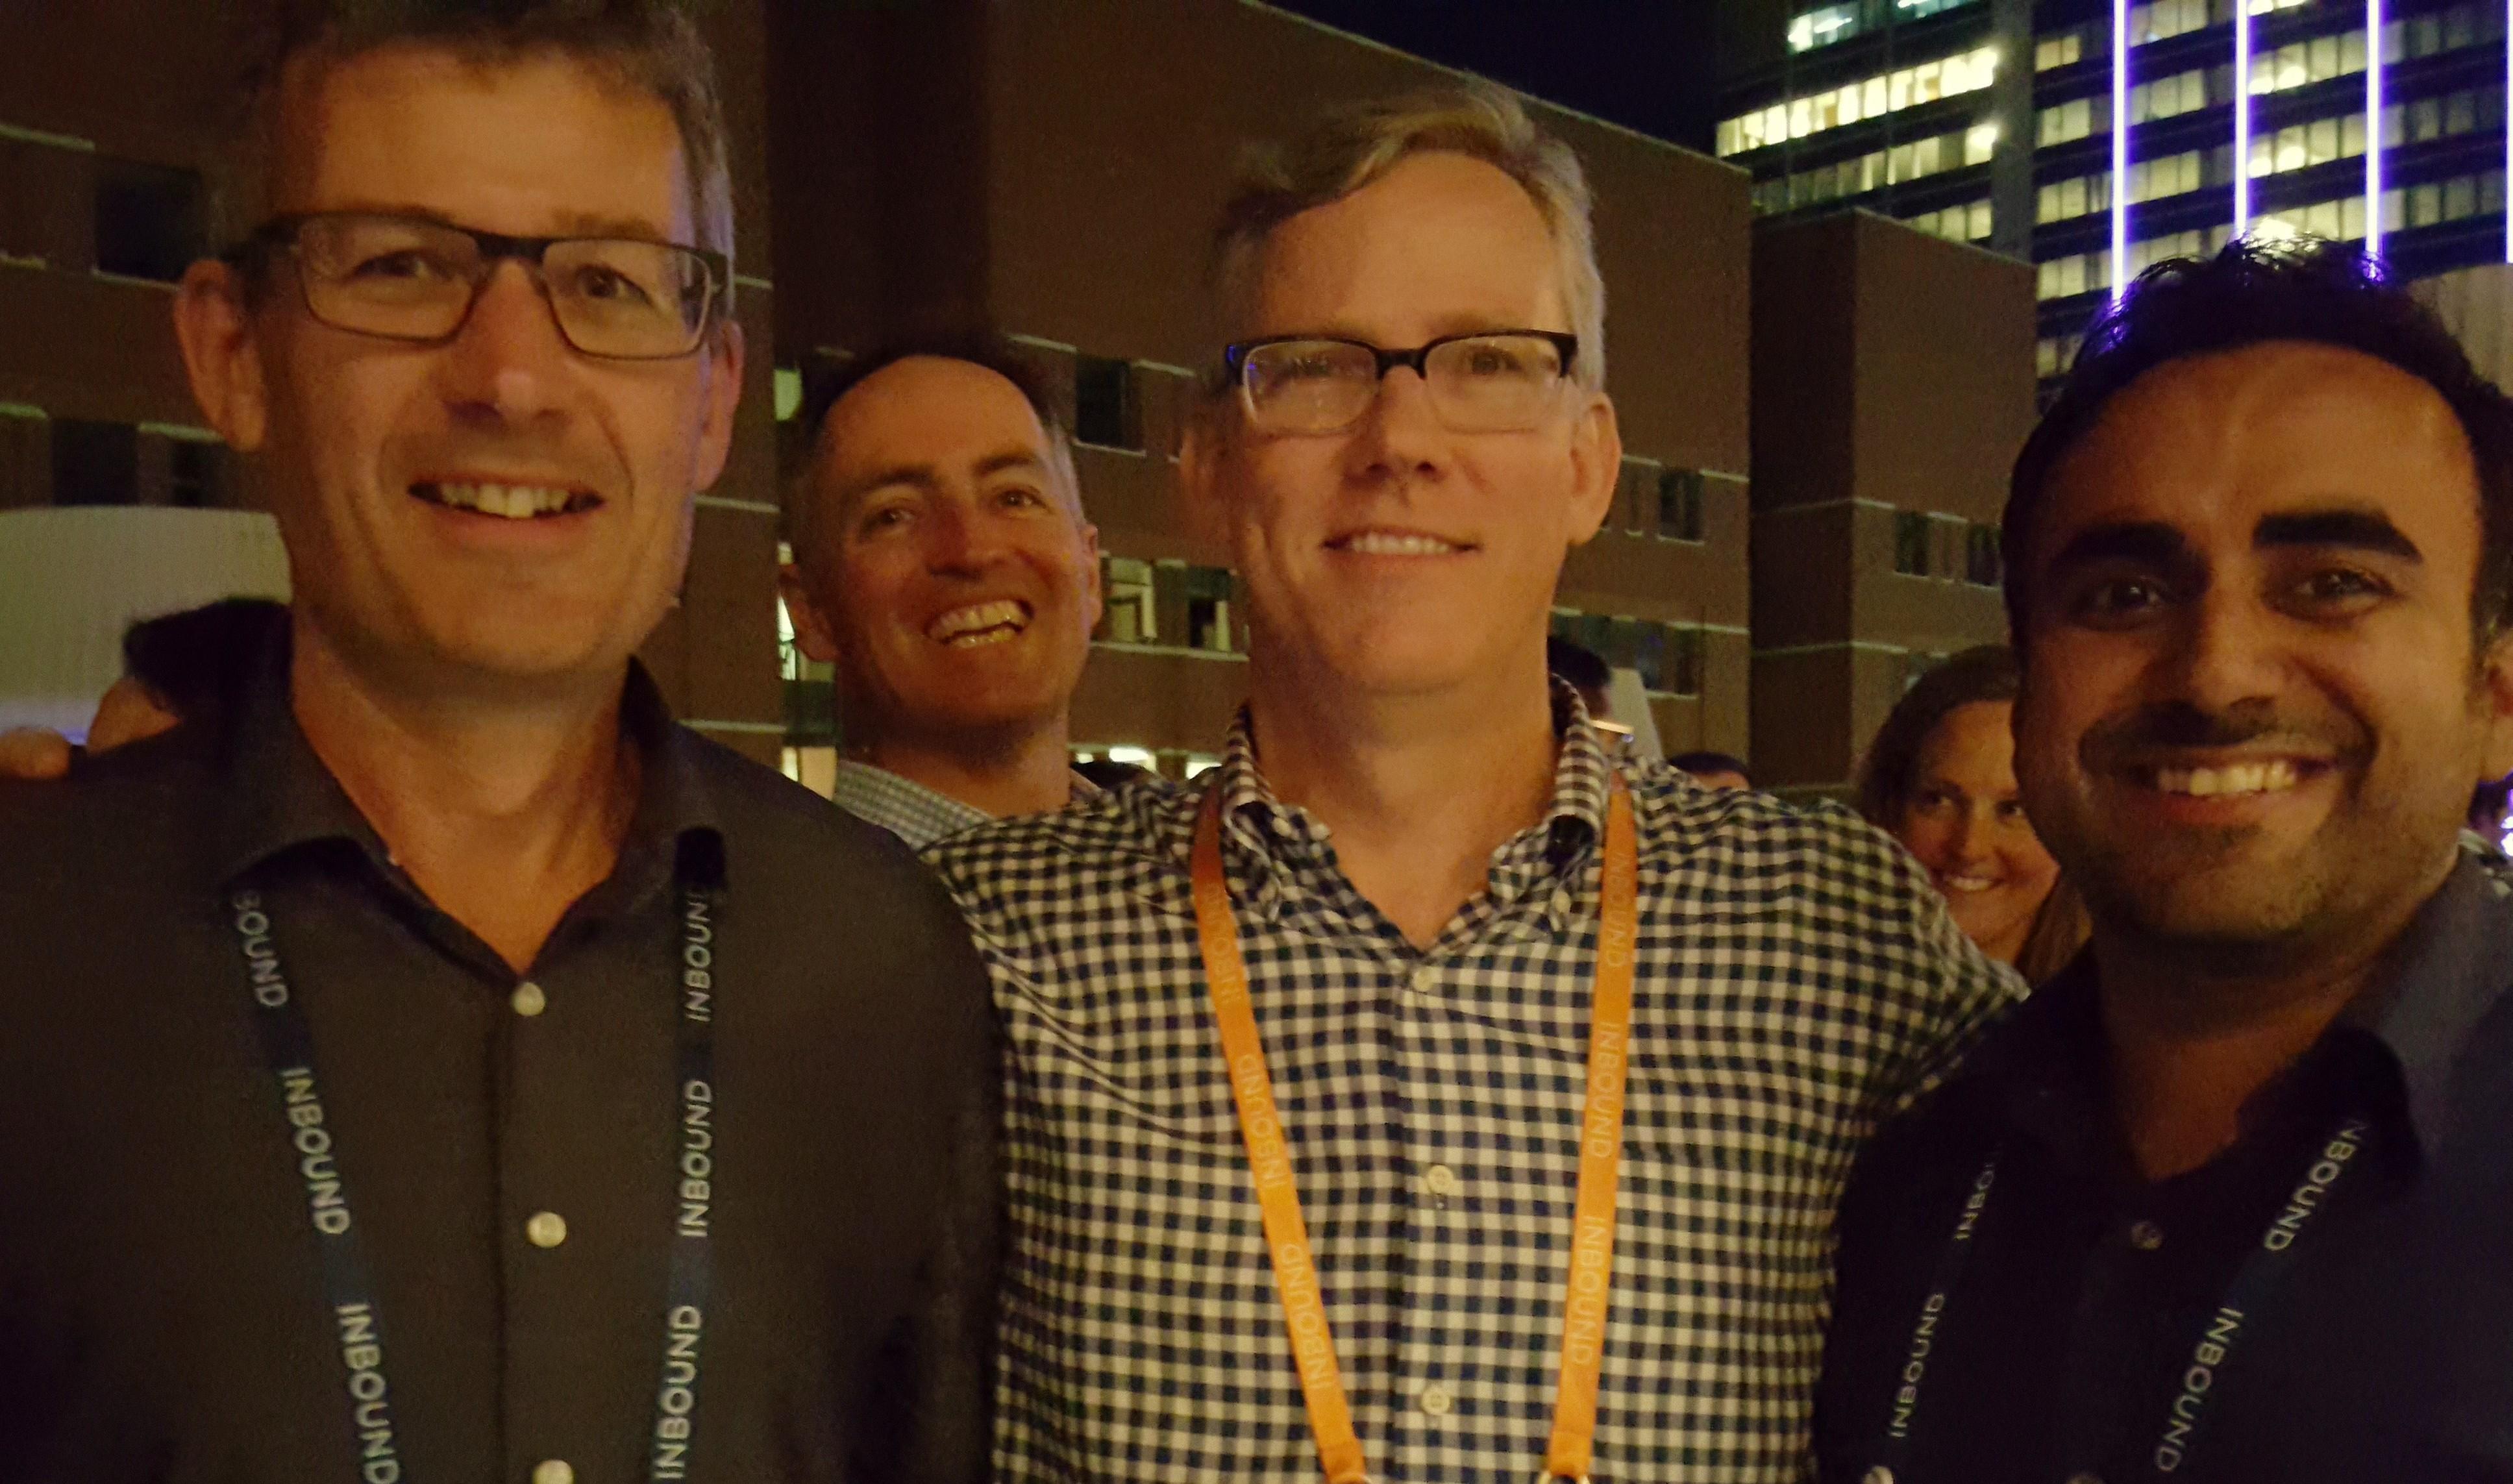 Owen Scott, Concentrate Managing Director; Brian Halligan, HubSpot CEO; Achan Bedi, Head of Inbound Marketing at Concentrate